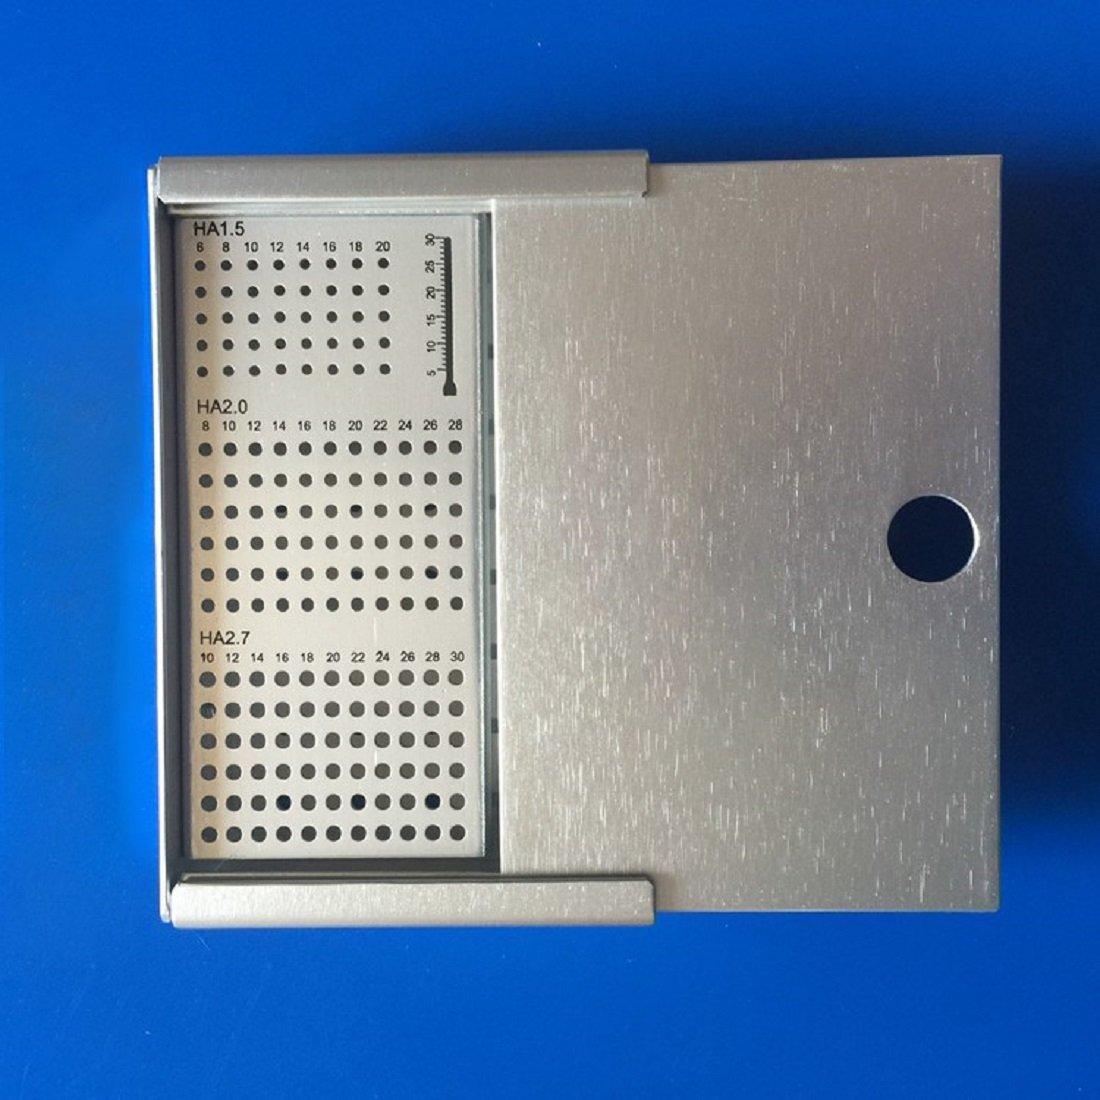 Tinsay Bone Screws Case Rack HA1.5mm 2.0mm 2.7mm Veterinary Orthopedics Instruments Stainess Steel by tinsay